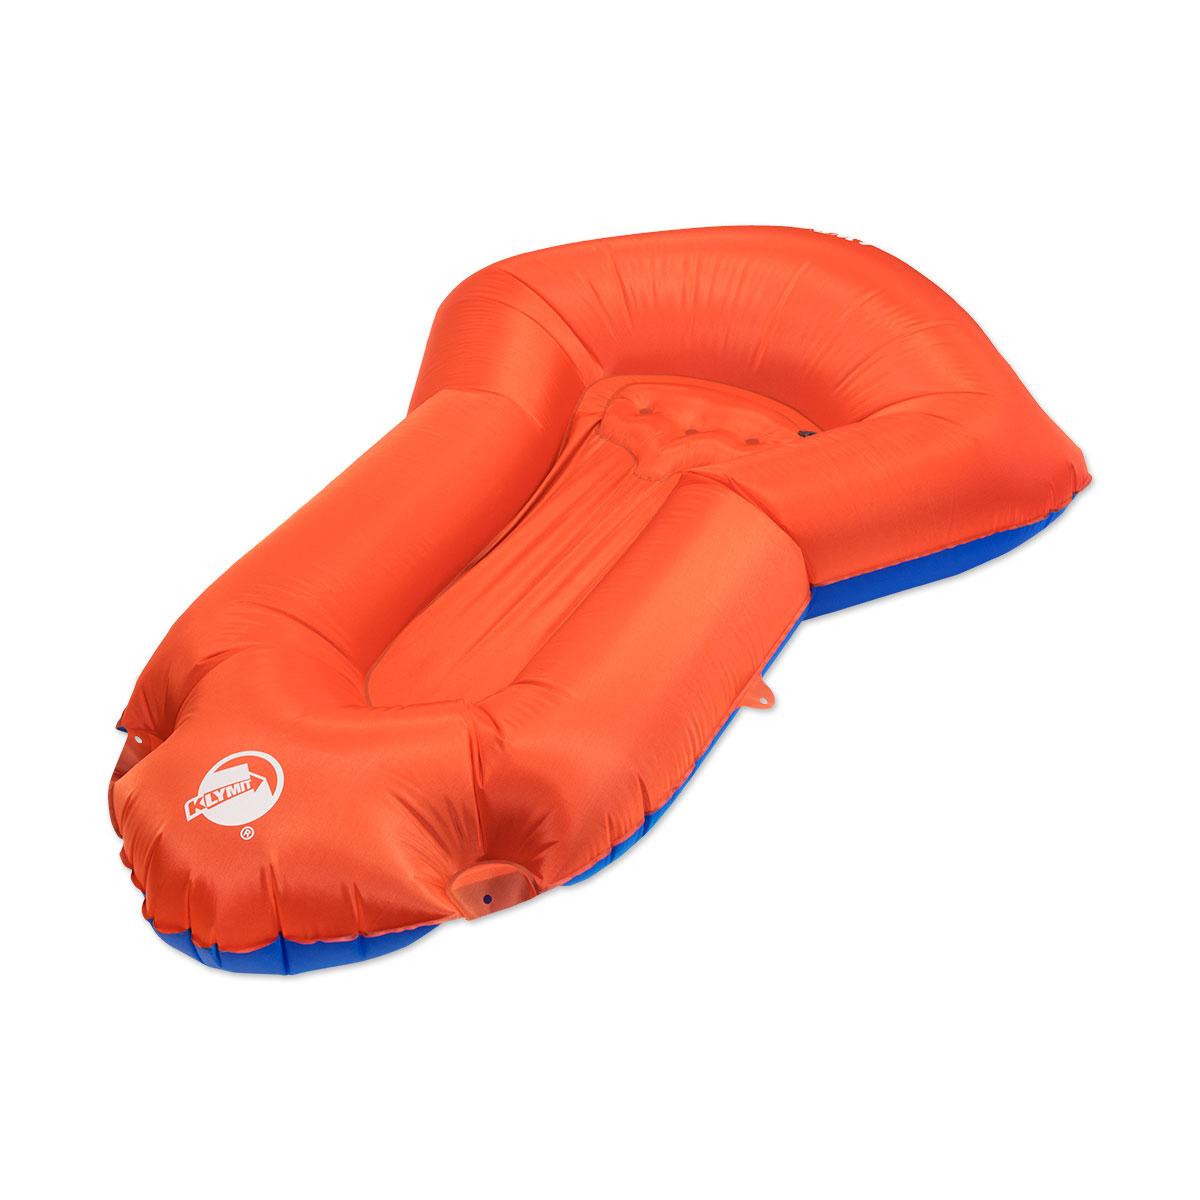 Надувная лодка Dinghy, оранжевая (14LDB101C)